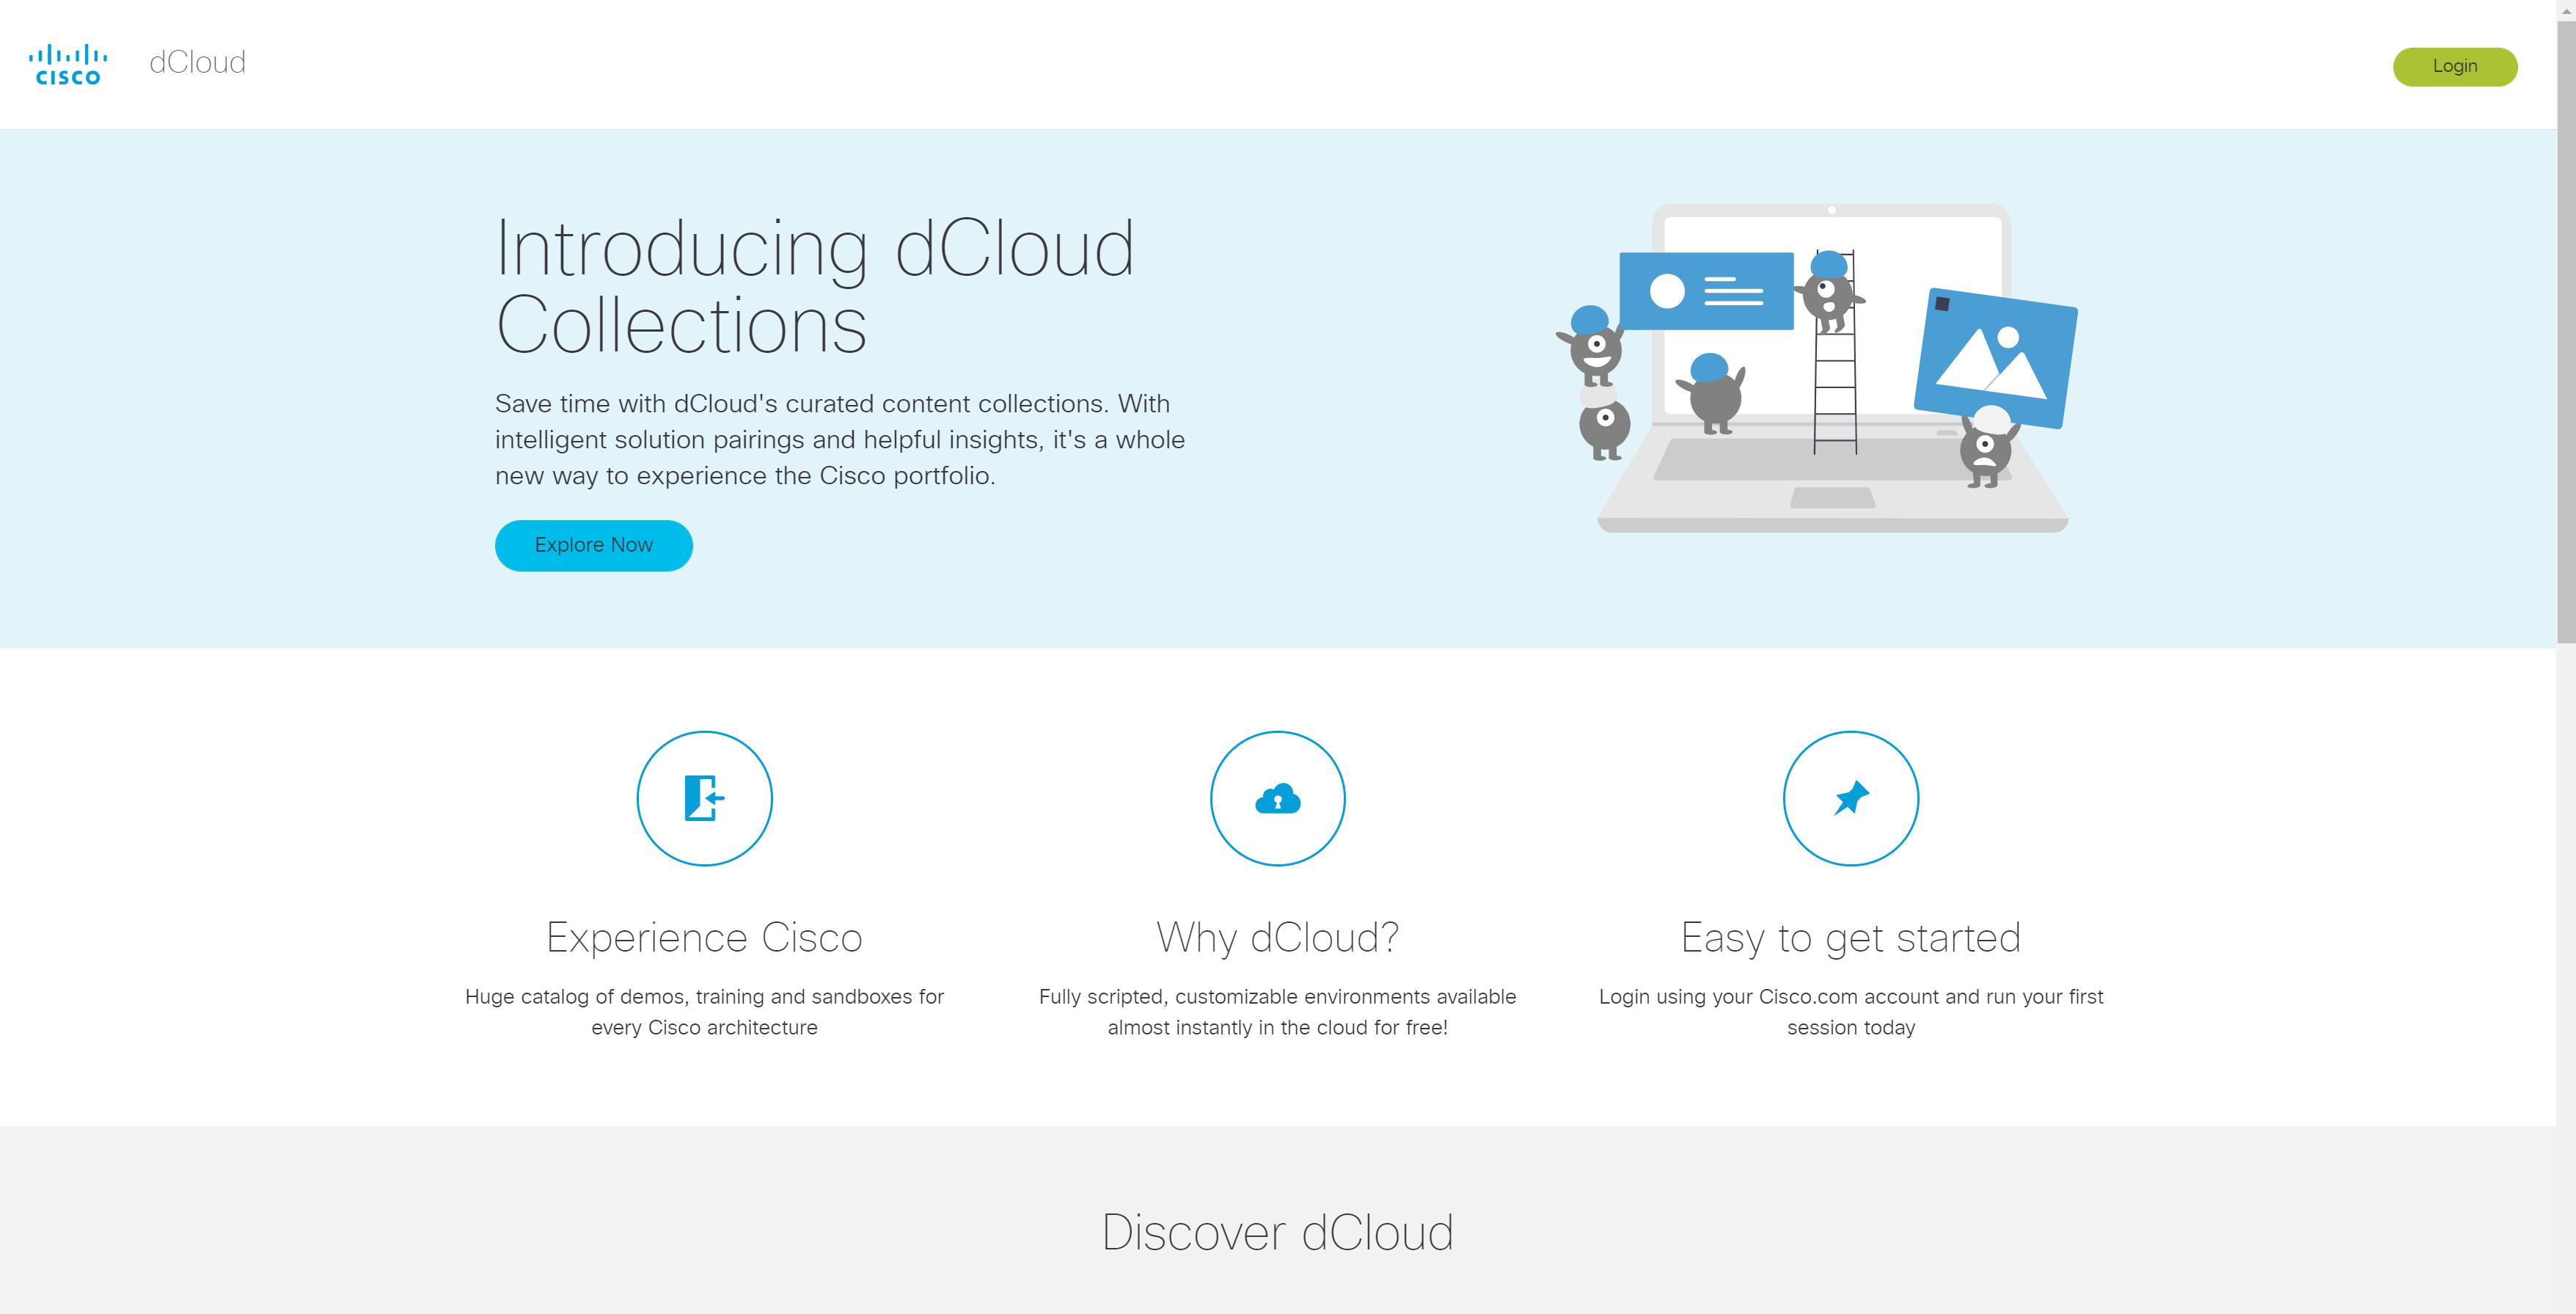 Cisco Dcloud